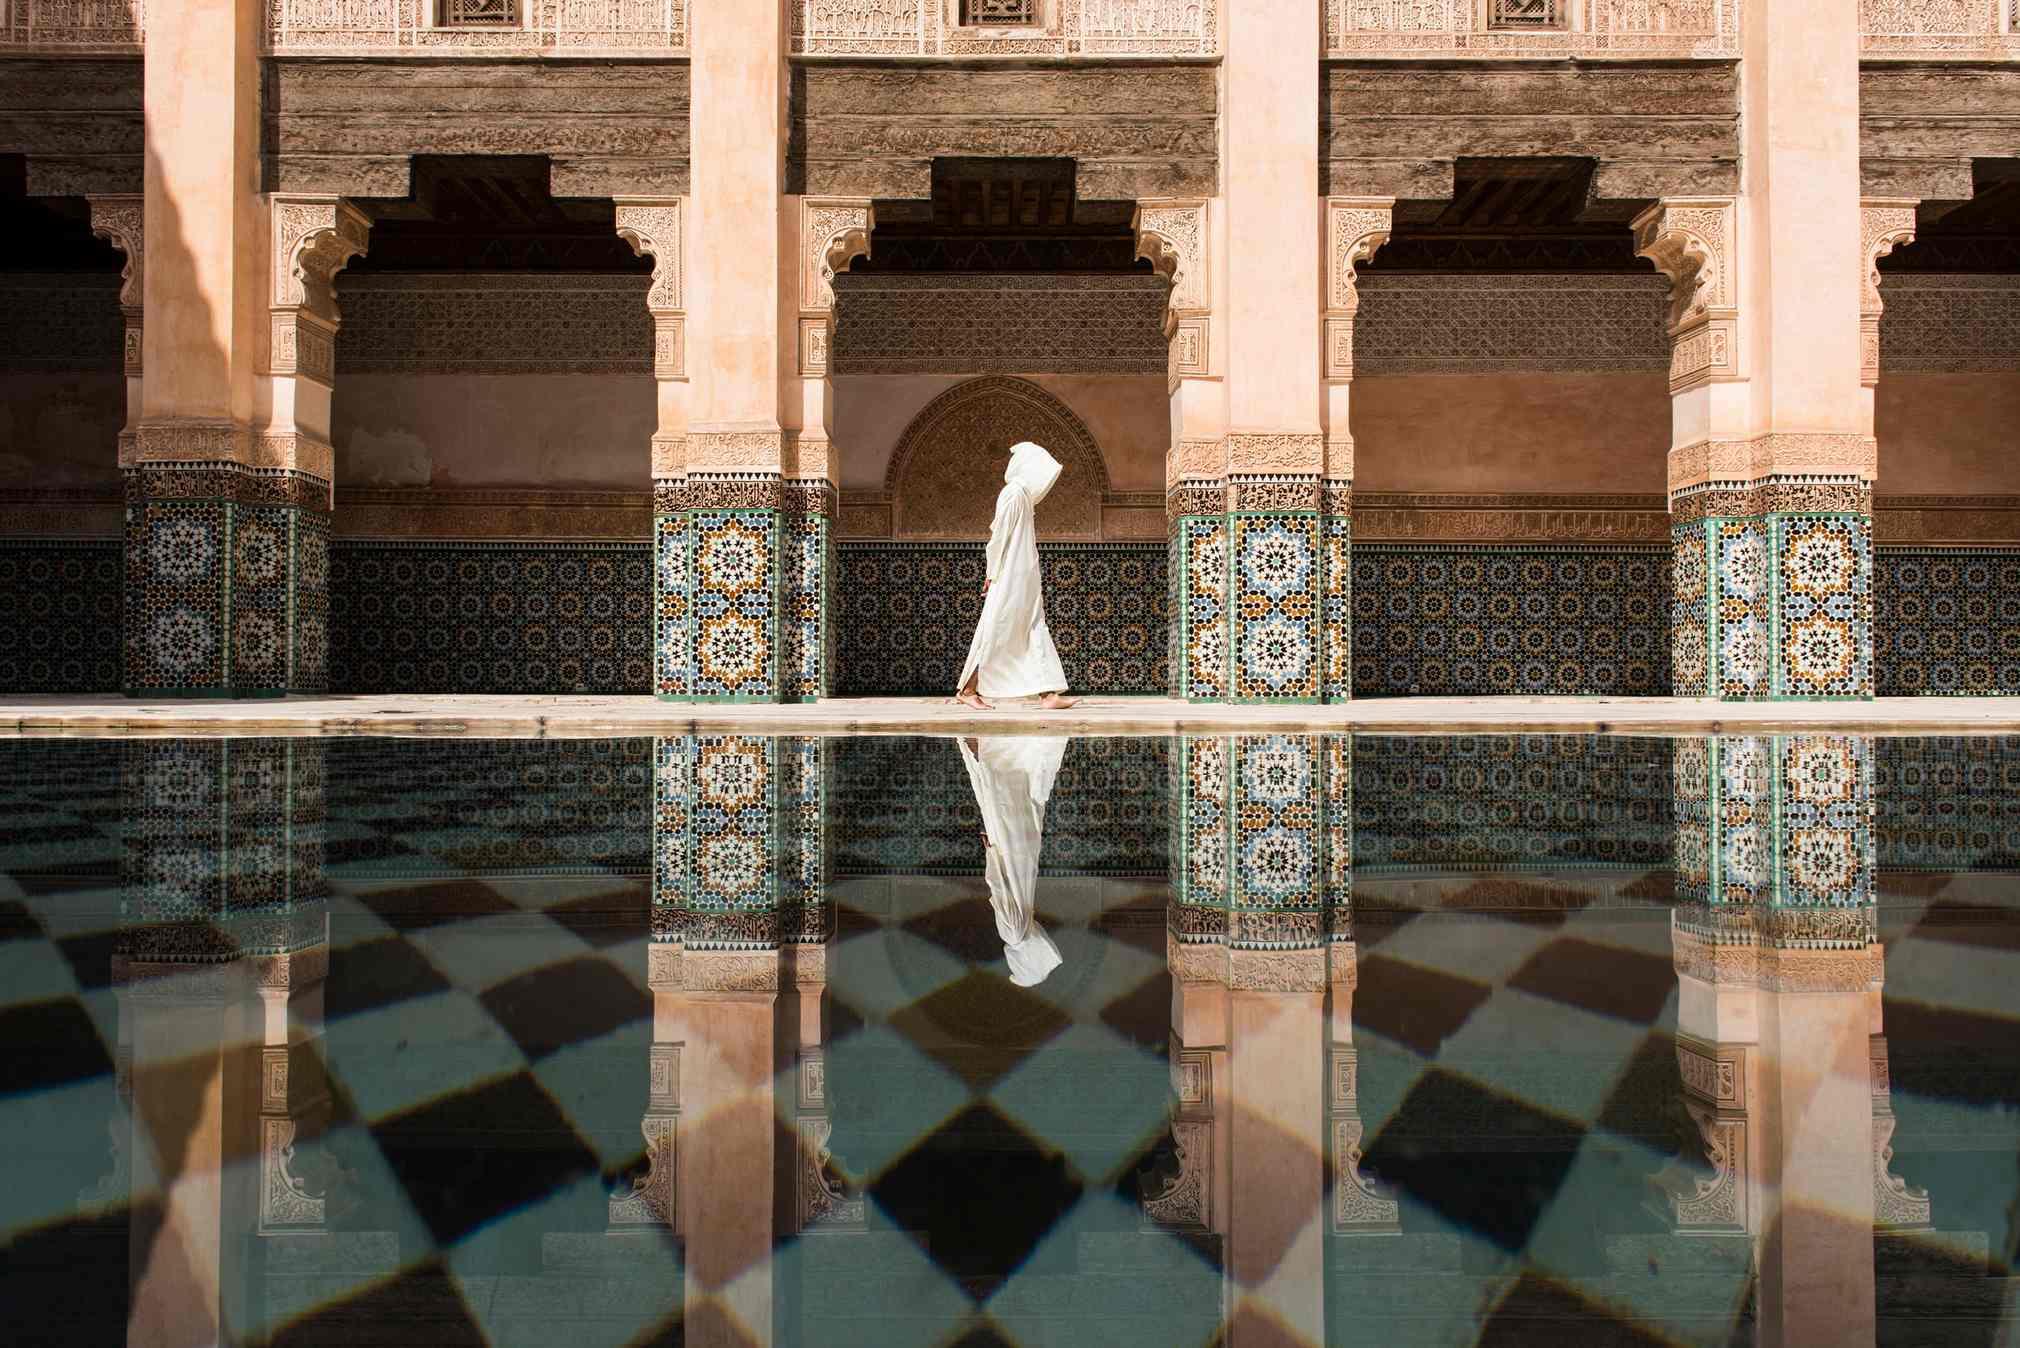 News: NatGeo announces travel photographers of the year